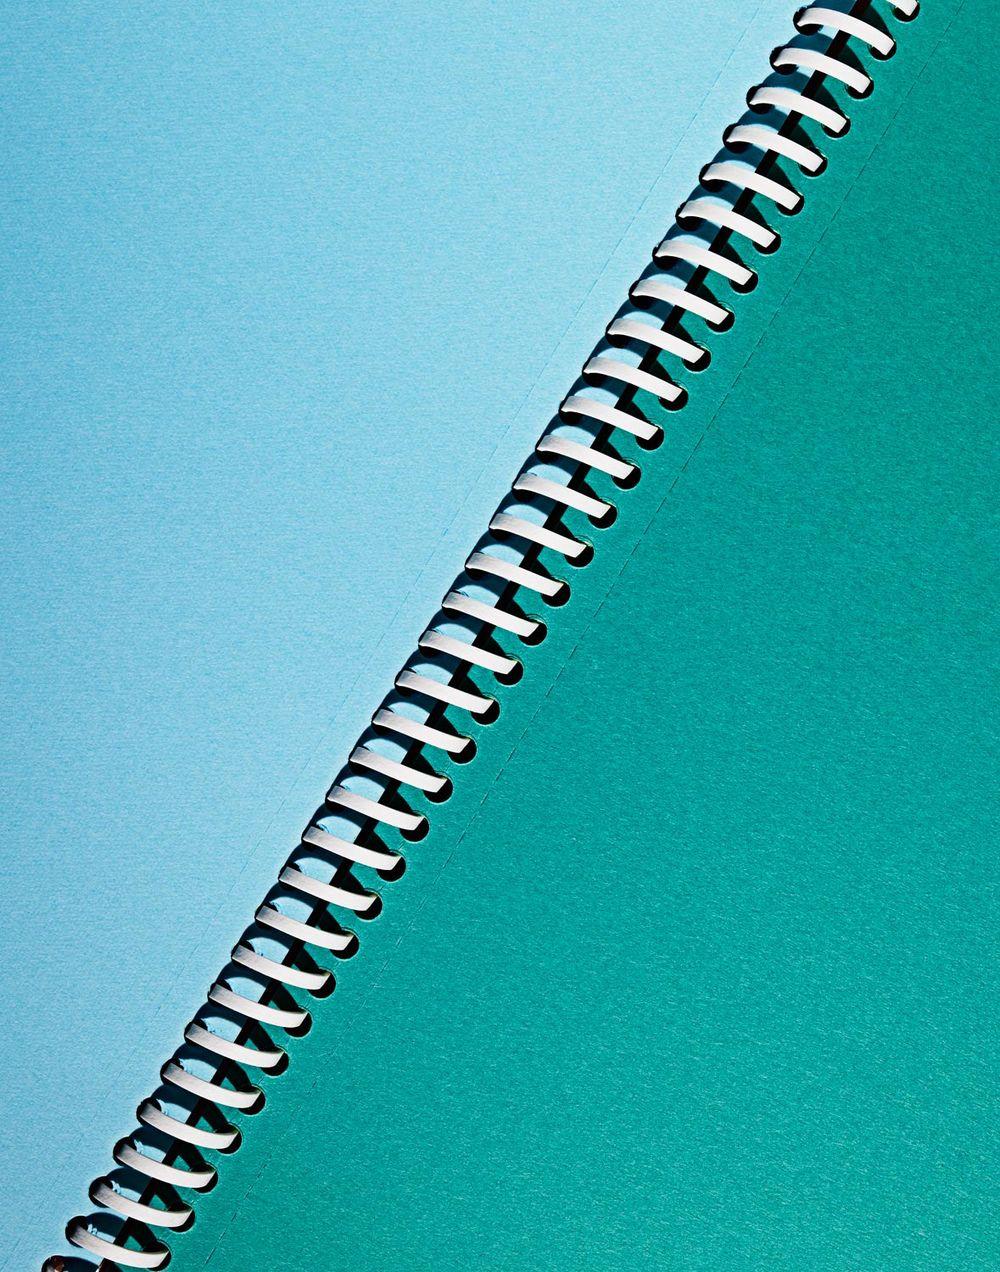 Light-Blue--Green-spiral-page.jpg